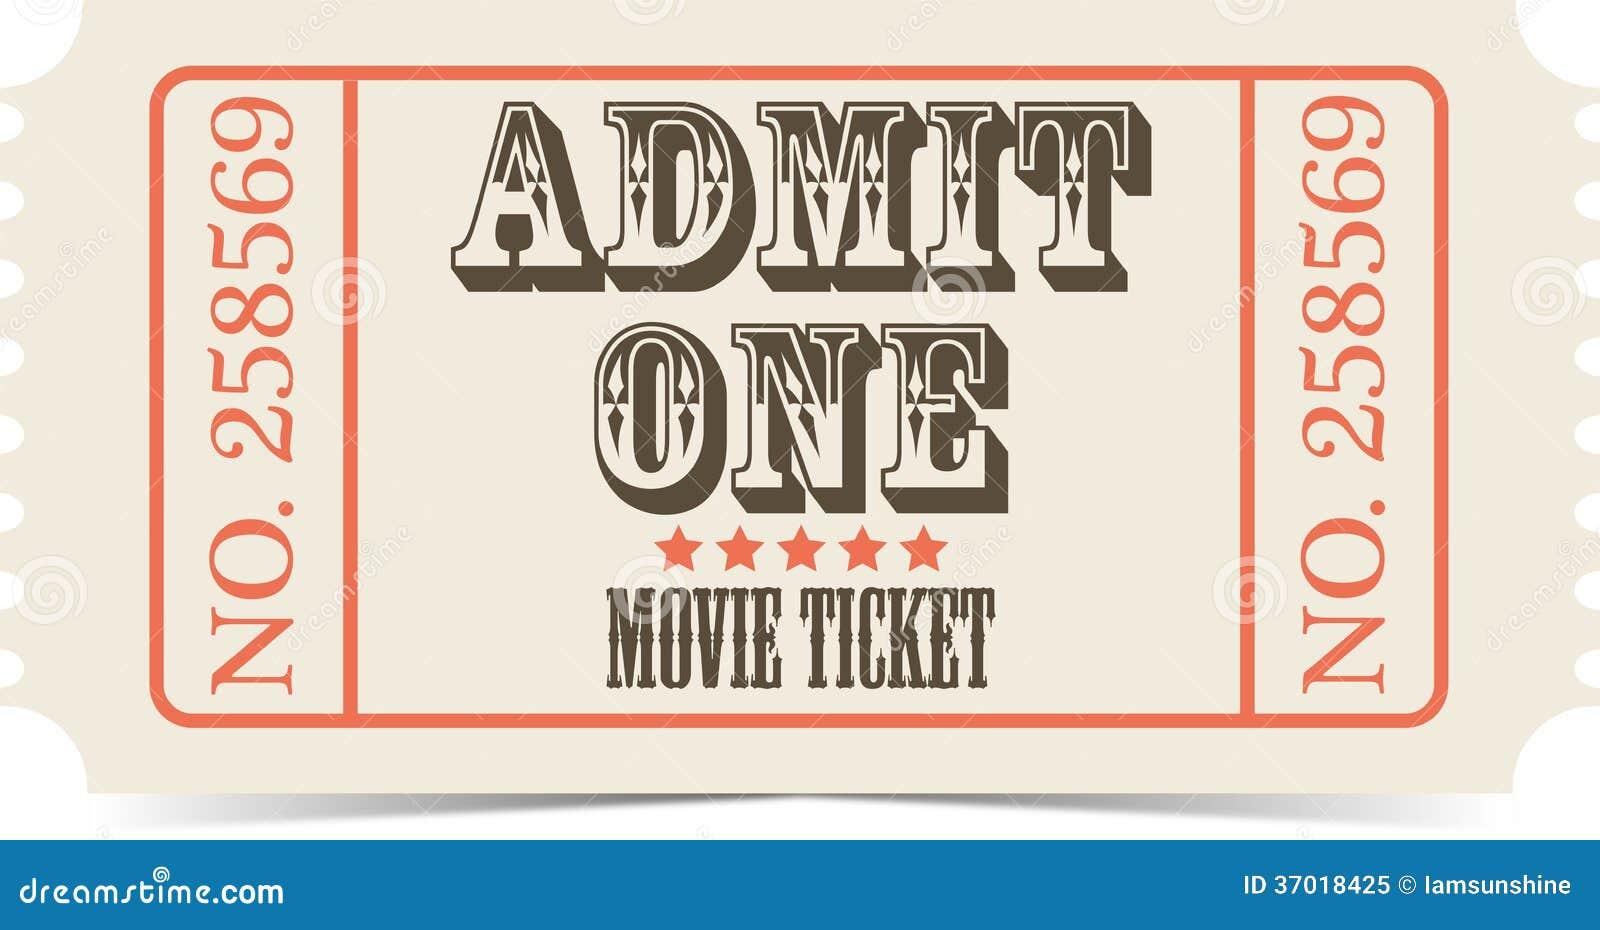 fake movie ticket template - retro movie vector ticket royalty free stock photo image